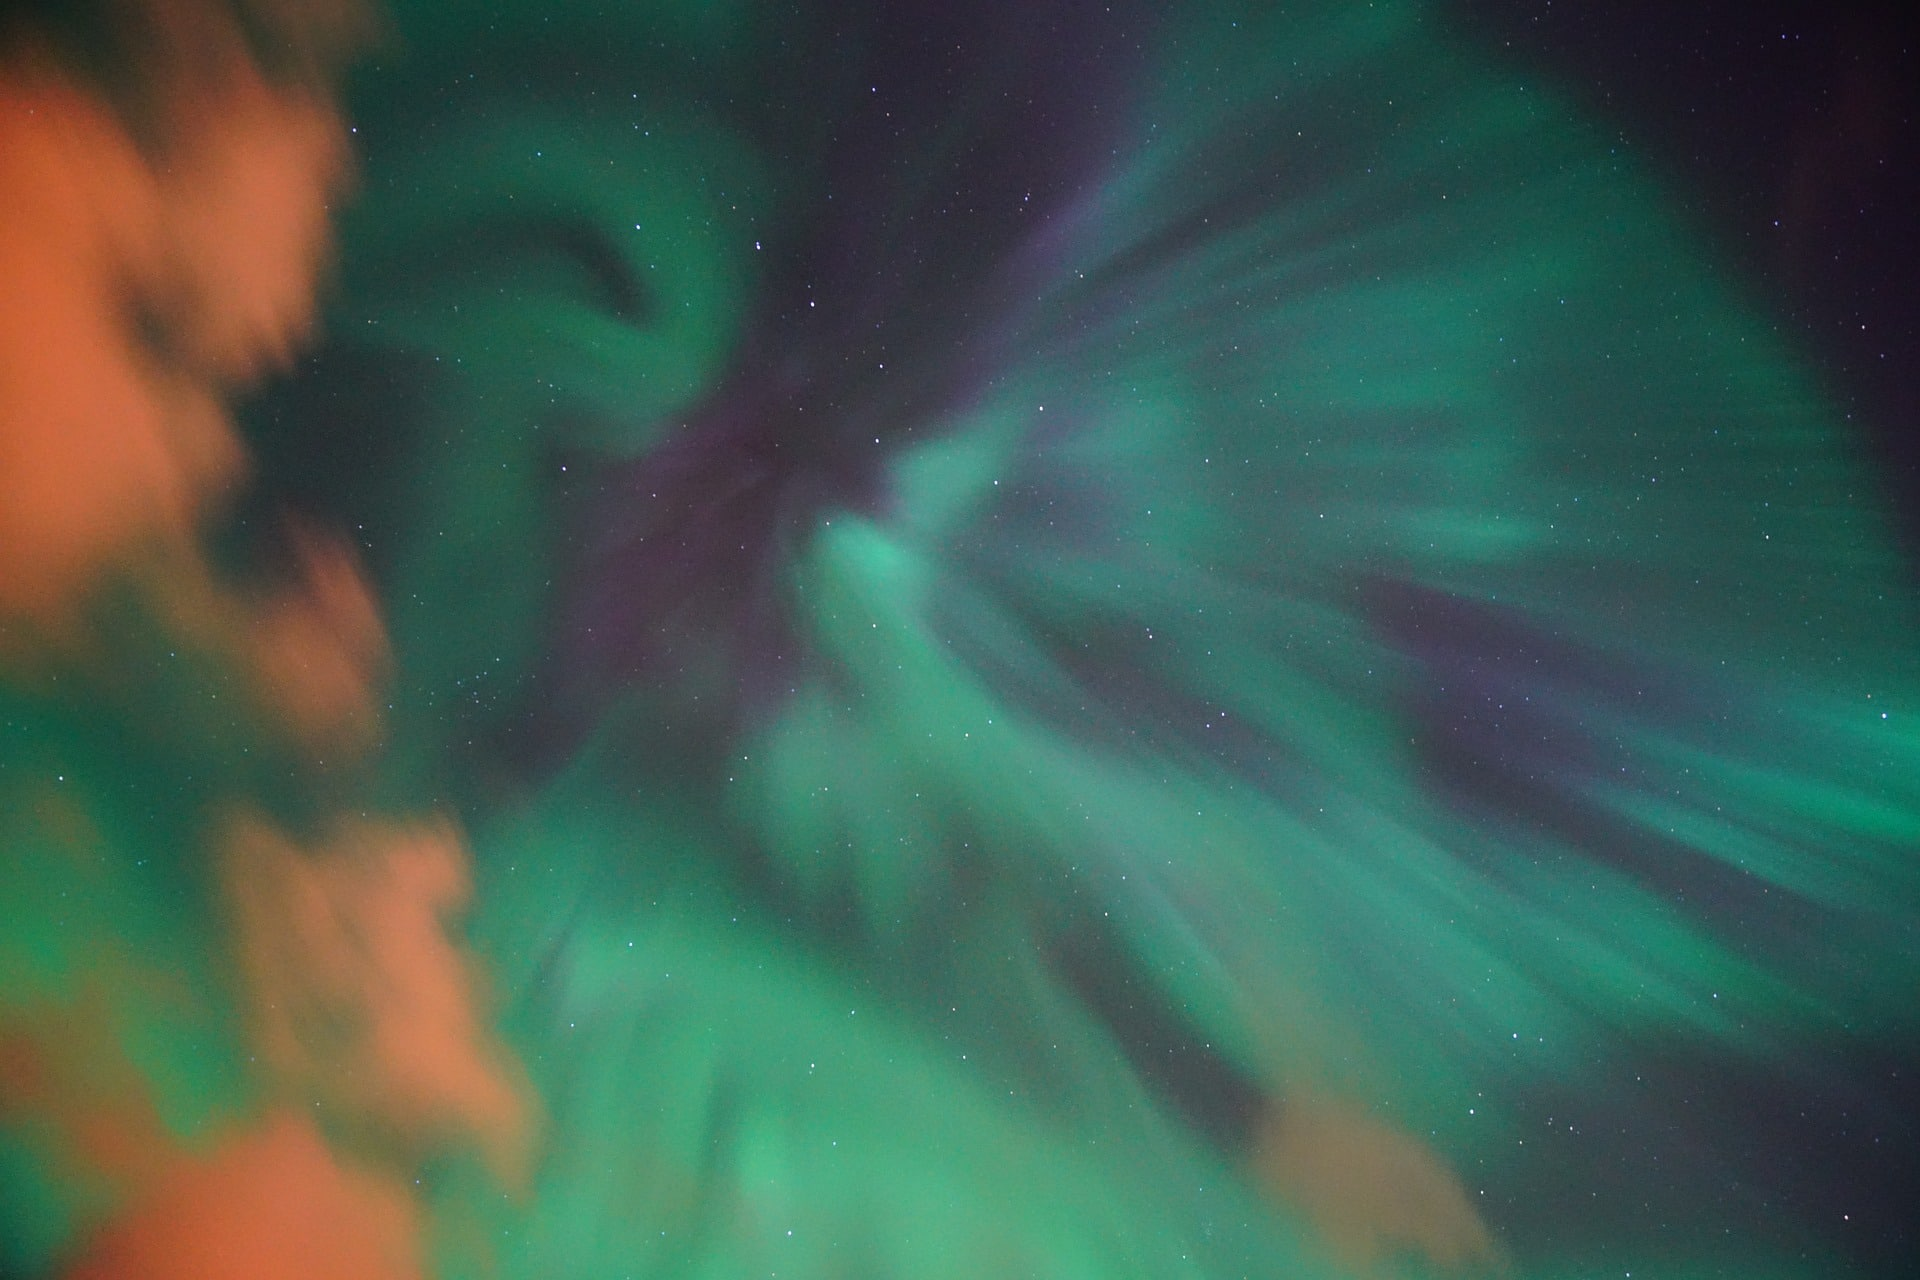 northern lights, aurora borealis, northern lights iceland, aurora forecast, best time to see northern lights, northern lights forecast, best time to see northern lights in iceland, aurora forecast iceland